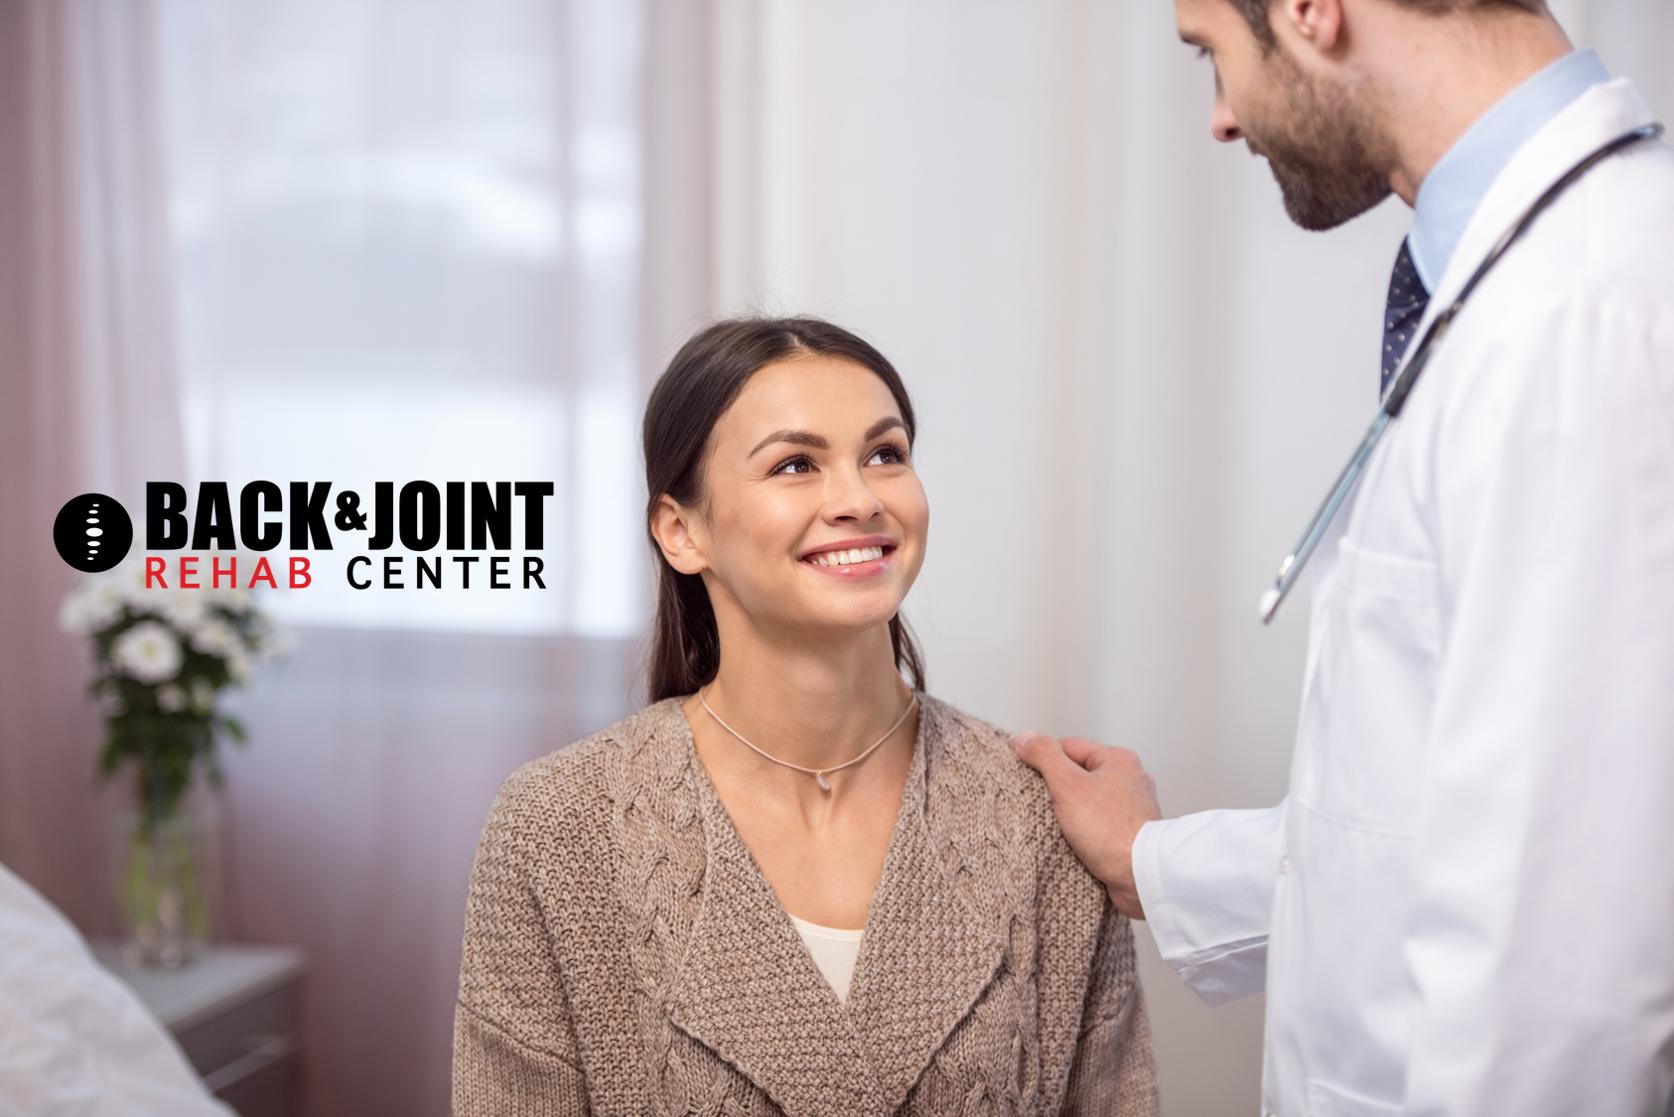 doctor, chiropractor, lower back pain, sciatica, herniated disc, crown point, indiana, lowell, merrillville, hobart, cedar lake, st john